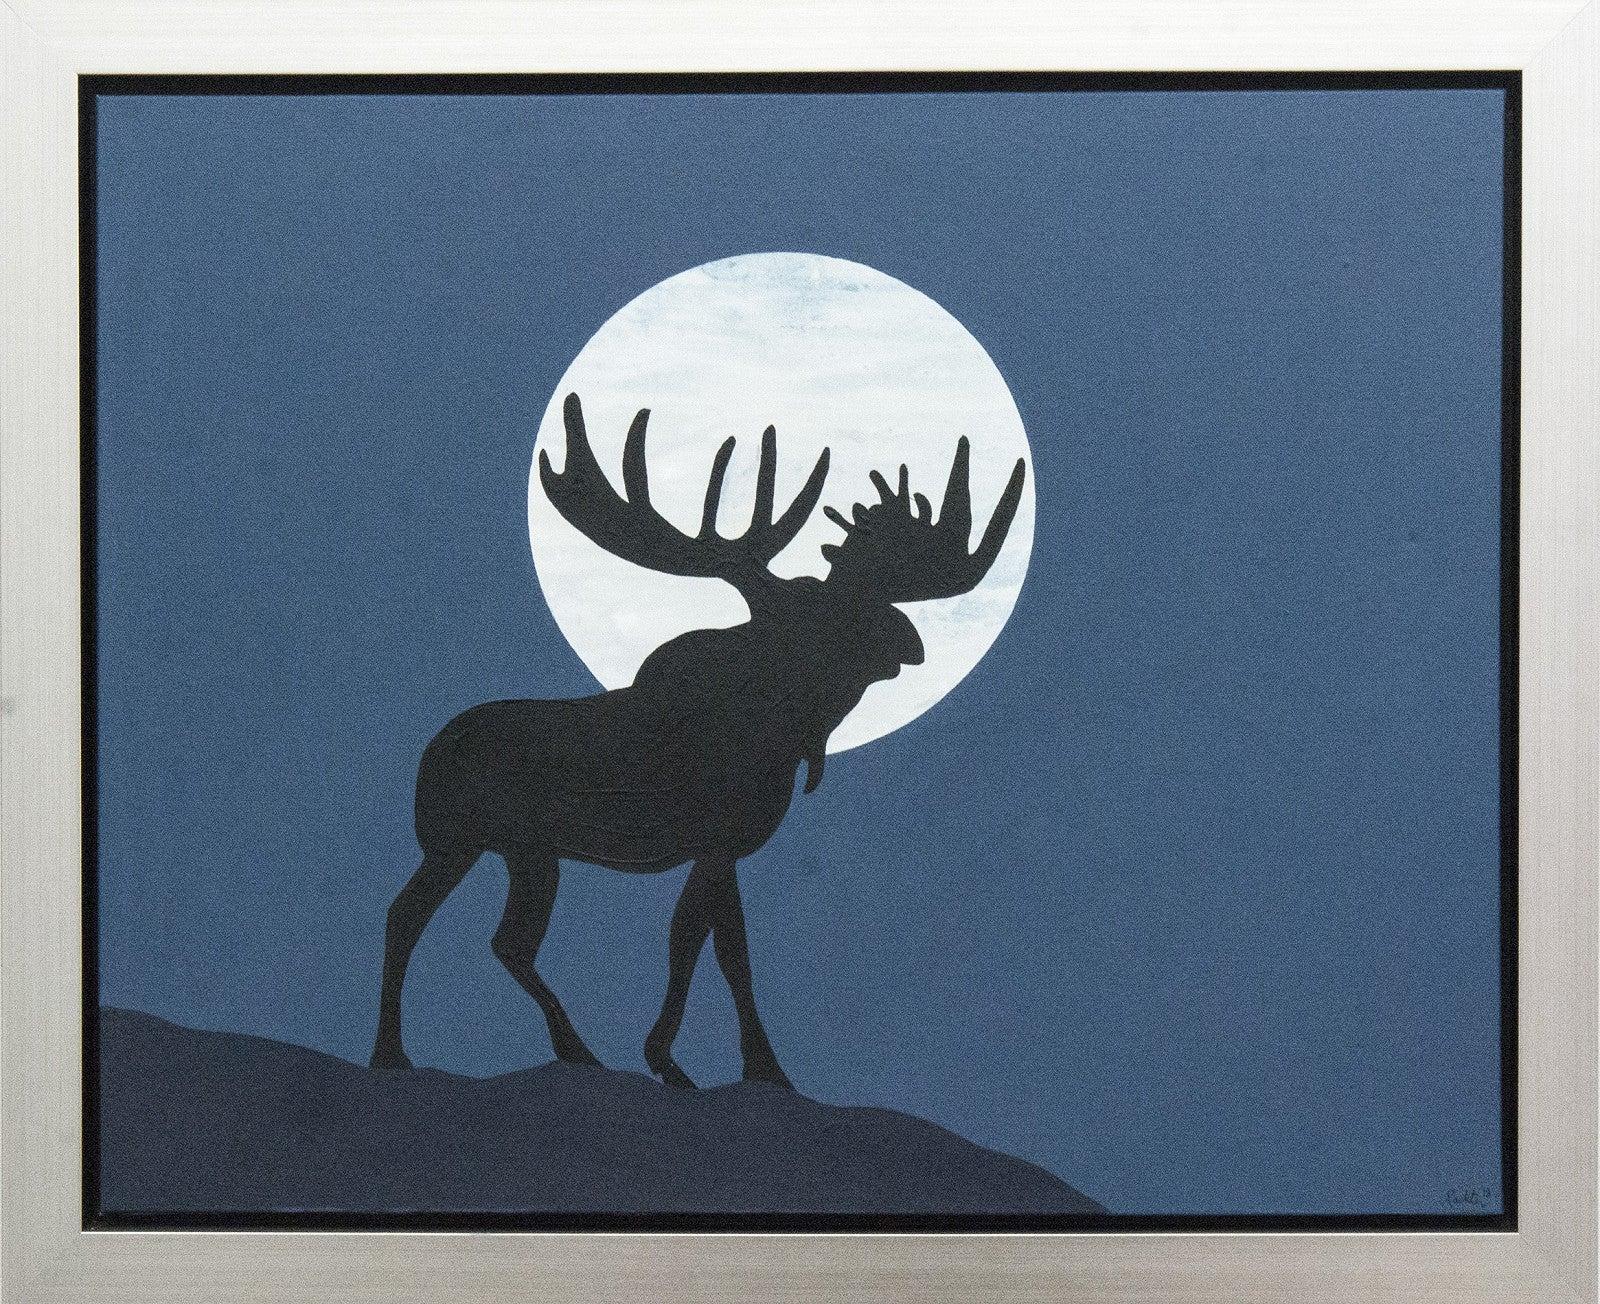 Lunar Moose - pop-art, Canadiana, iconic, contemporary, acrylic on canvas